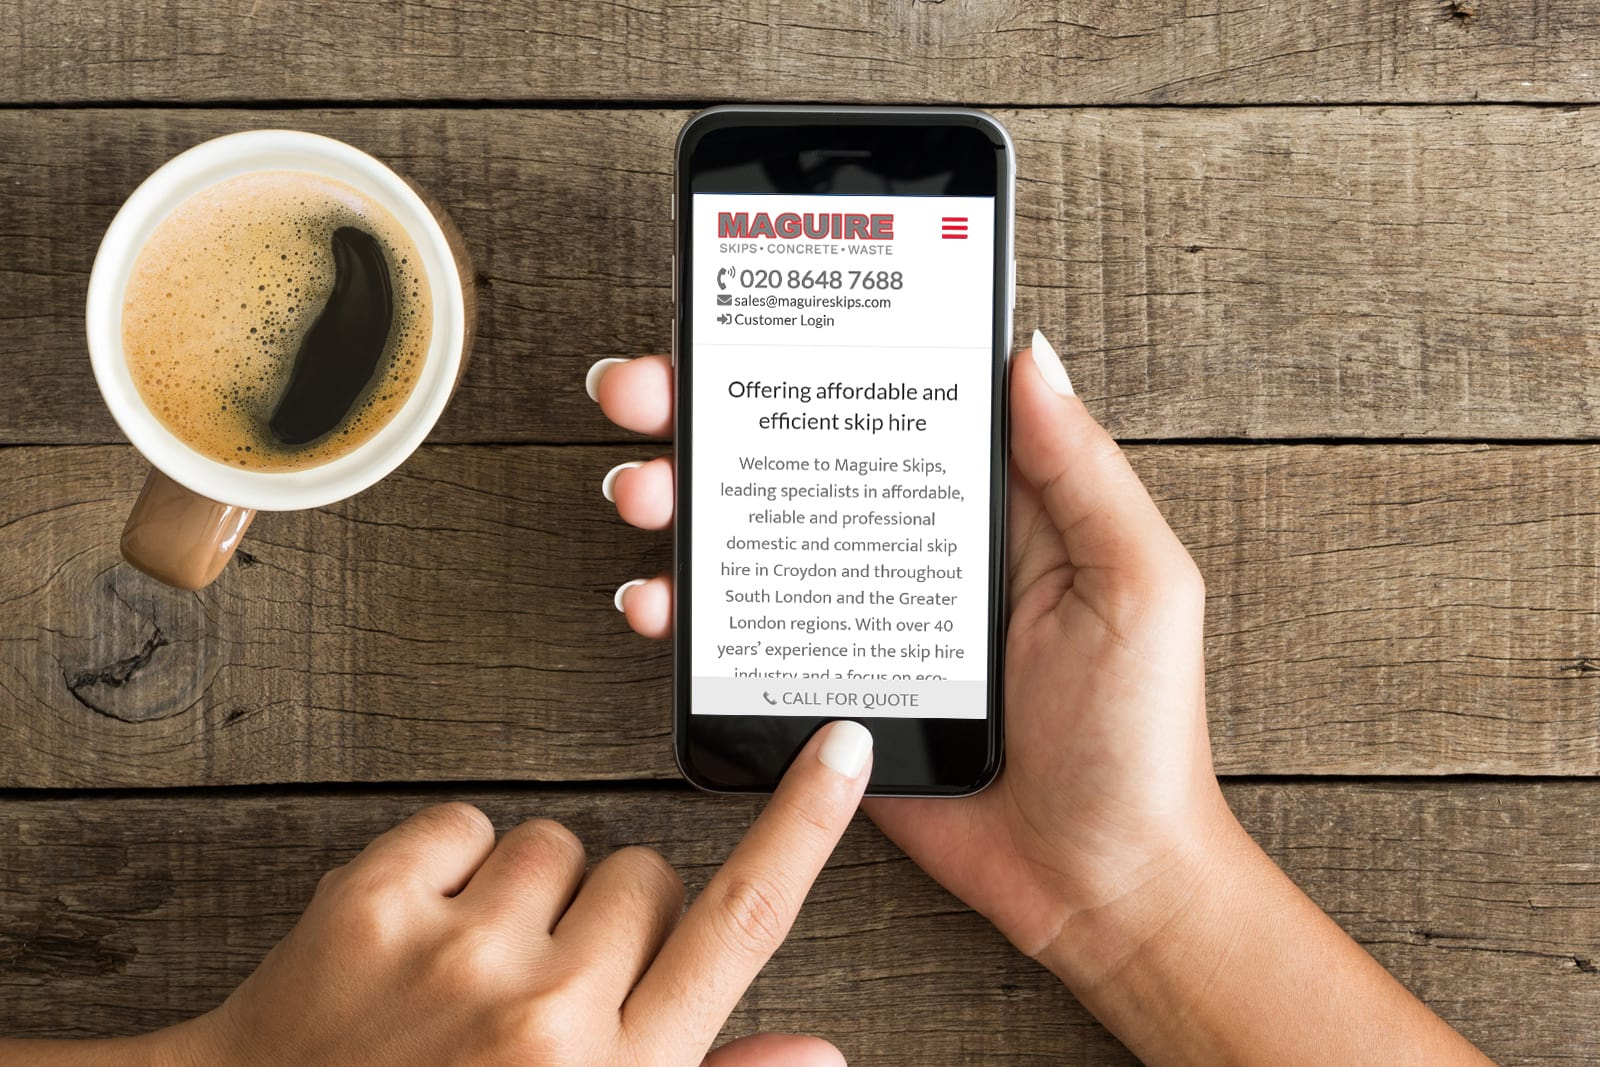 Maguire Skips website designed and built by JJ Solutions - Surrey web designers